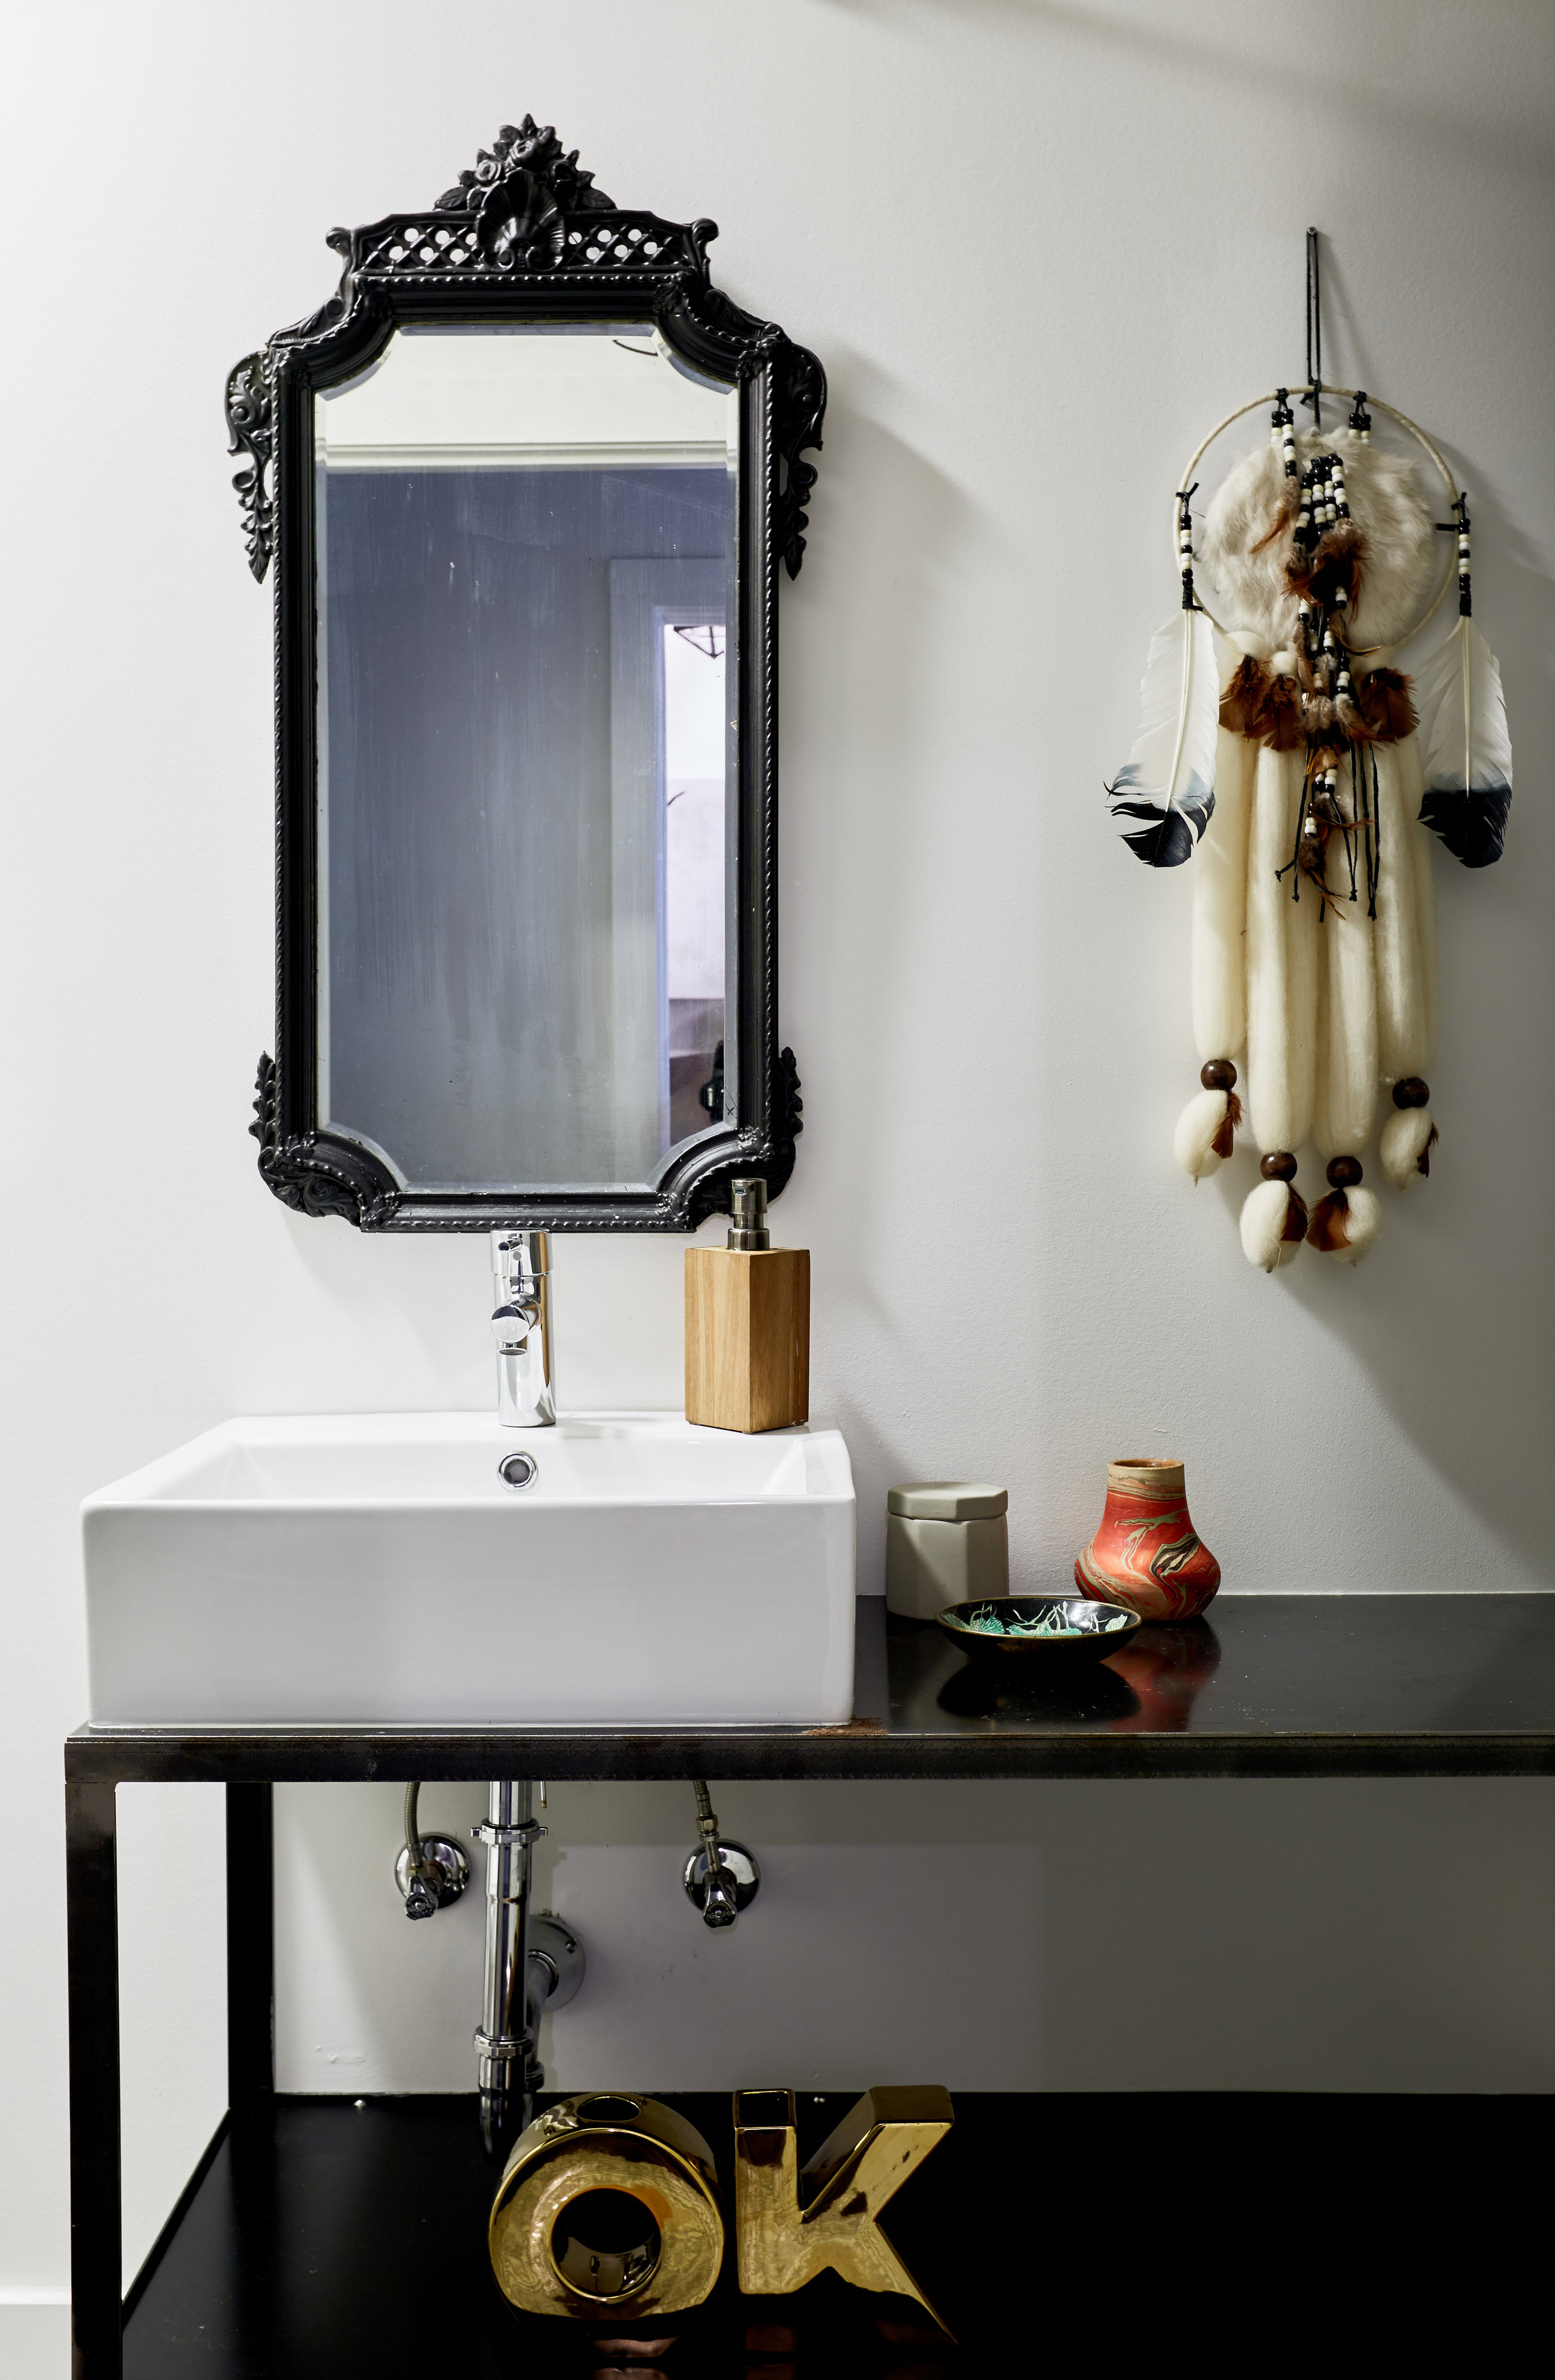 El_Motel_Bathroom_896.jpg